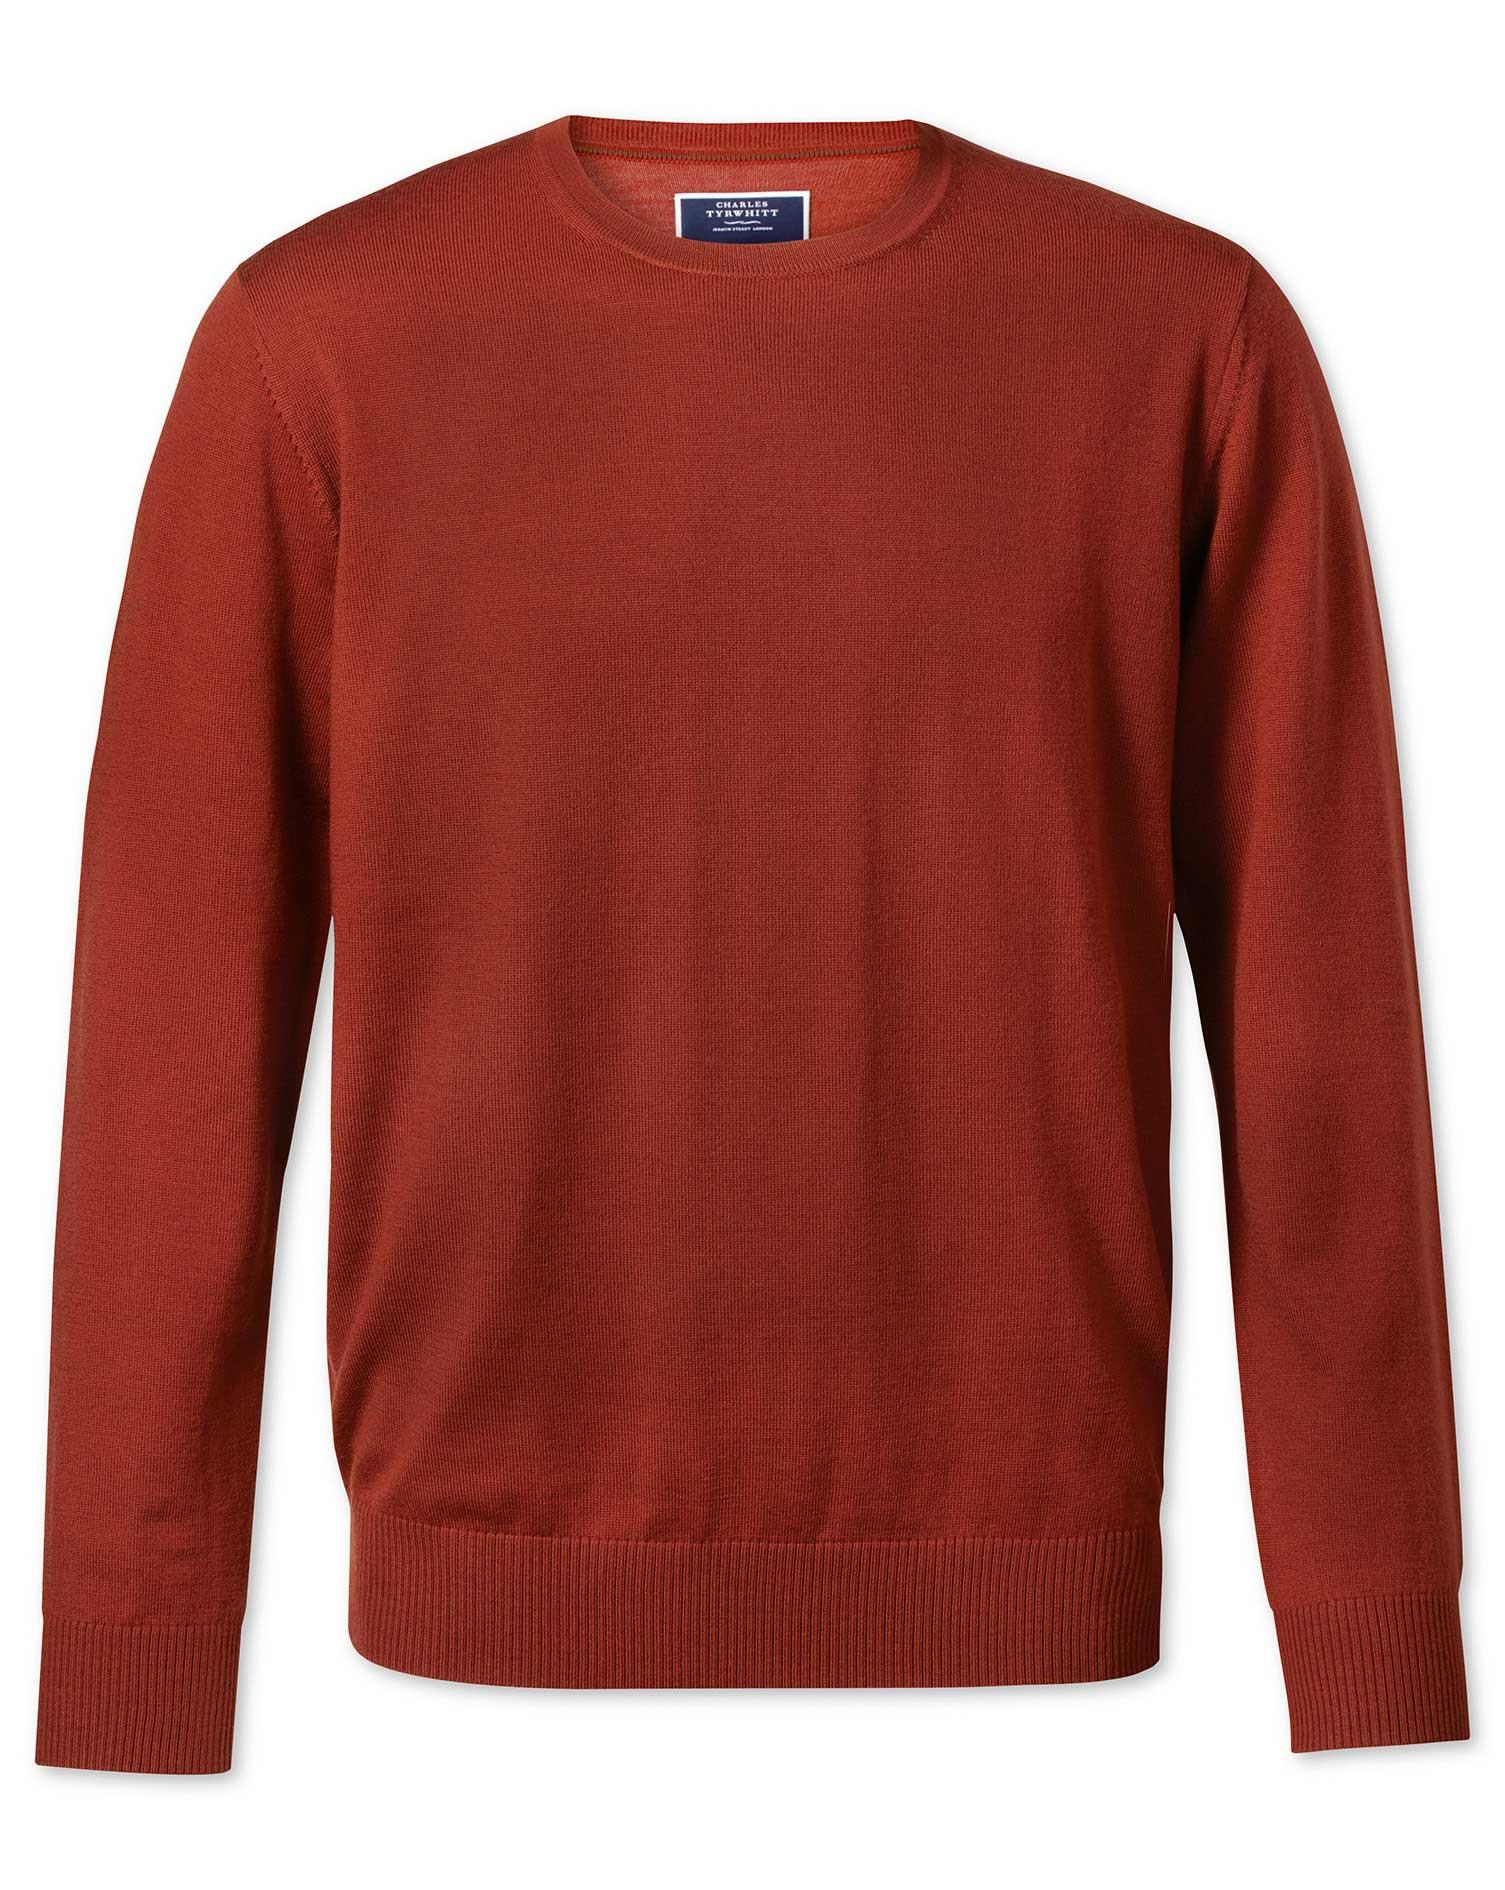 Rust Crew Neck Merino Wool Jumper Size Medium by Charles Tyrwhitt